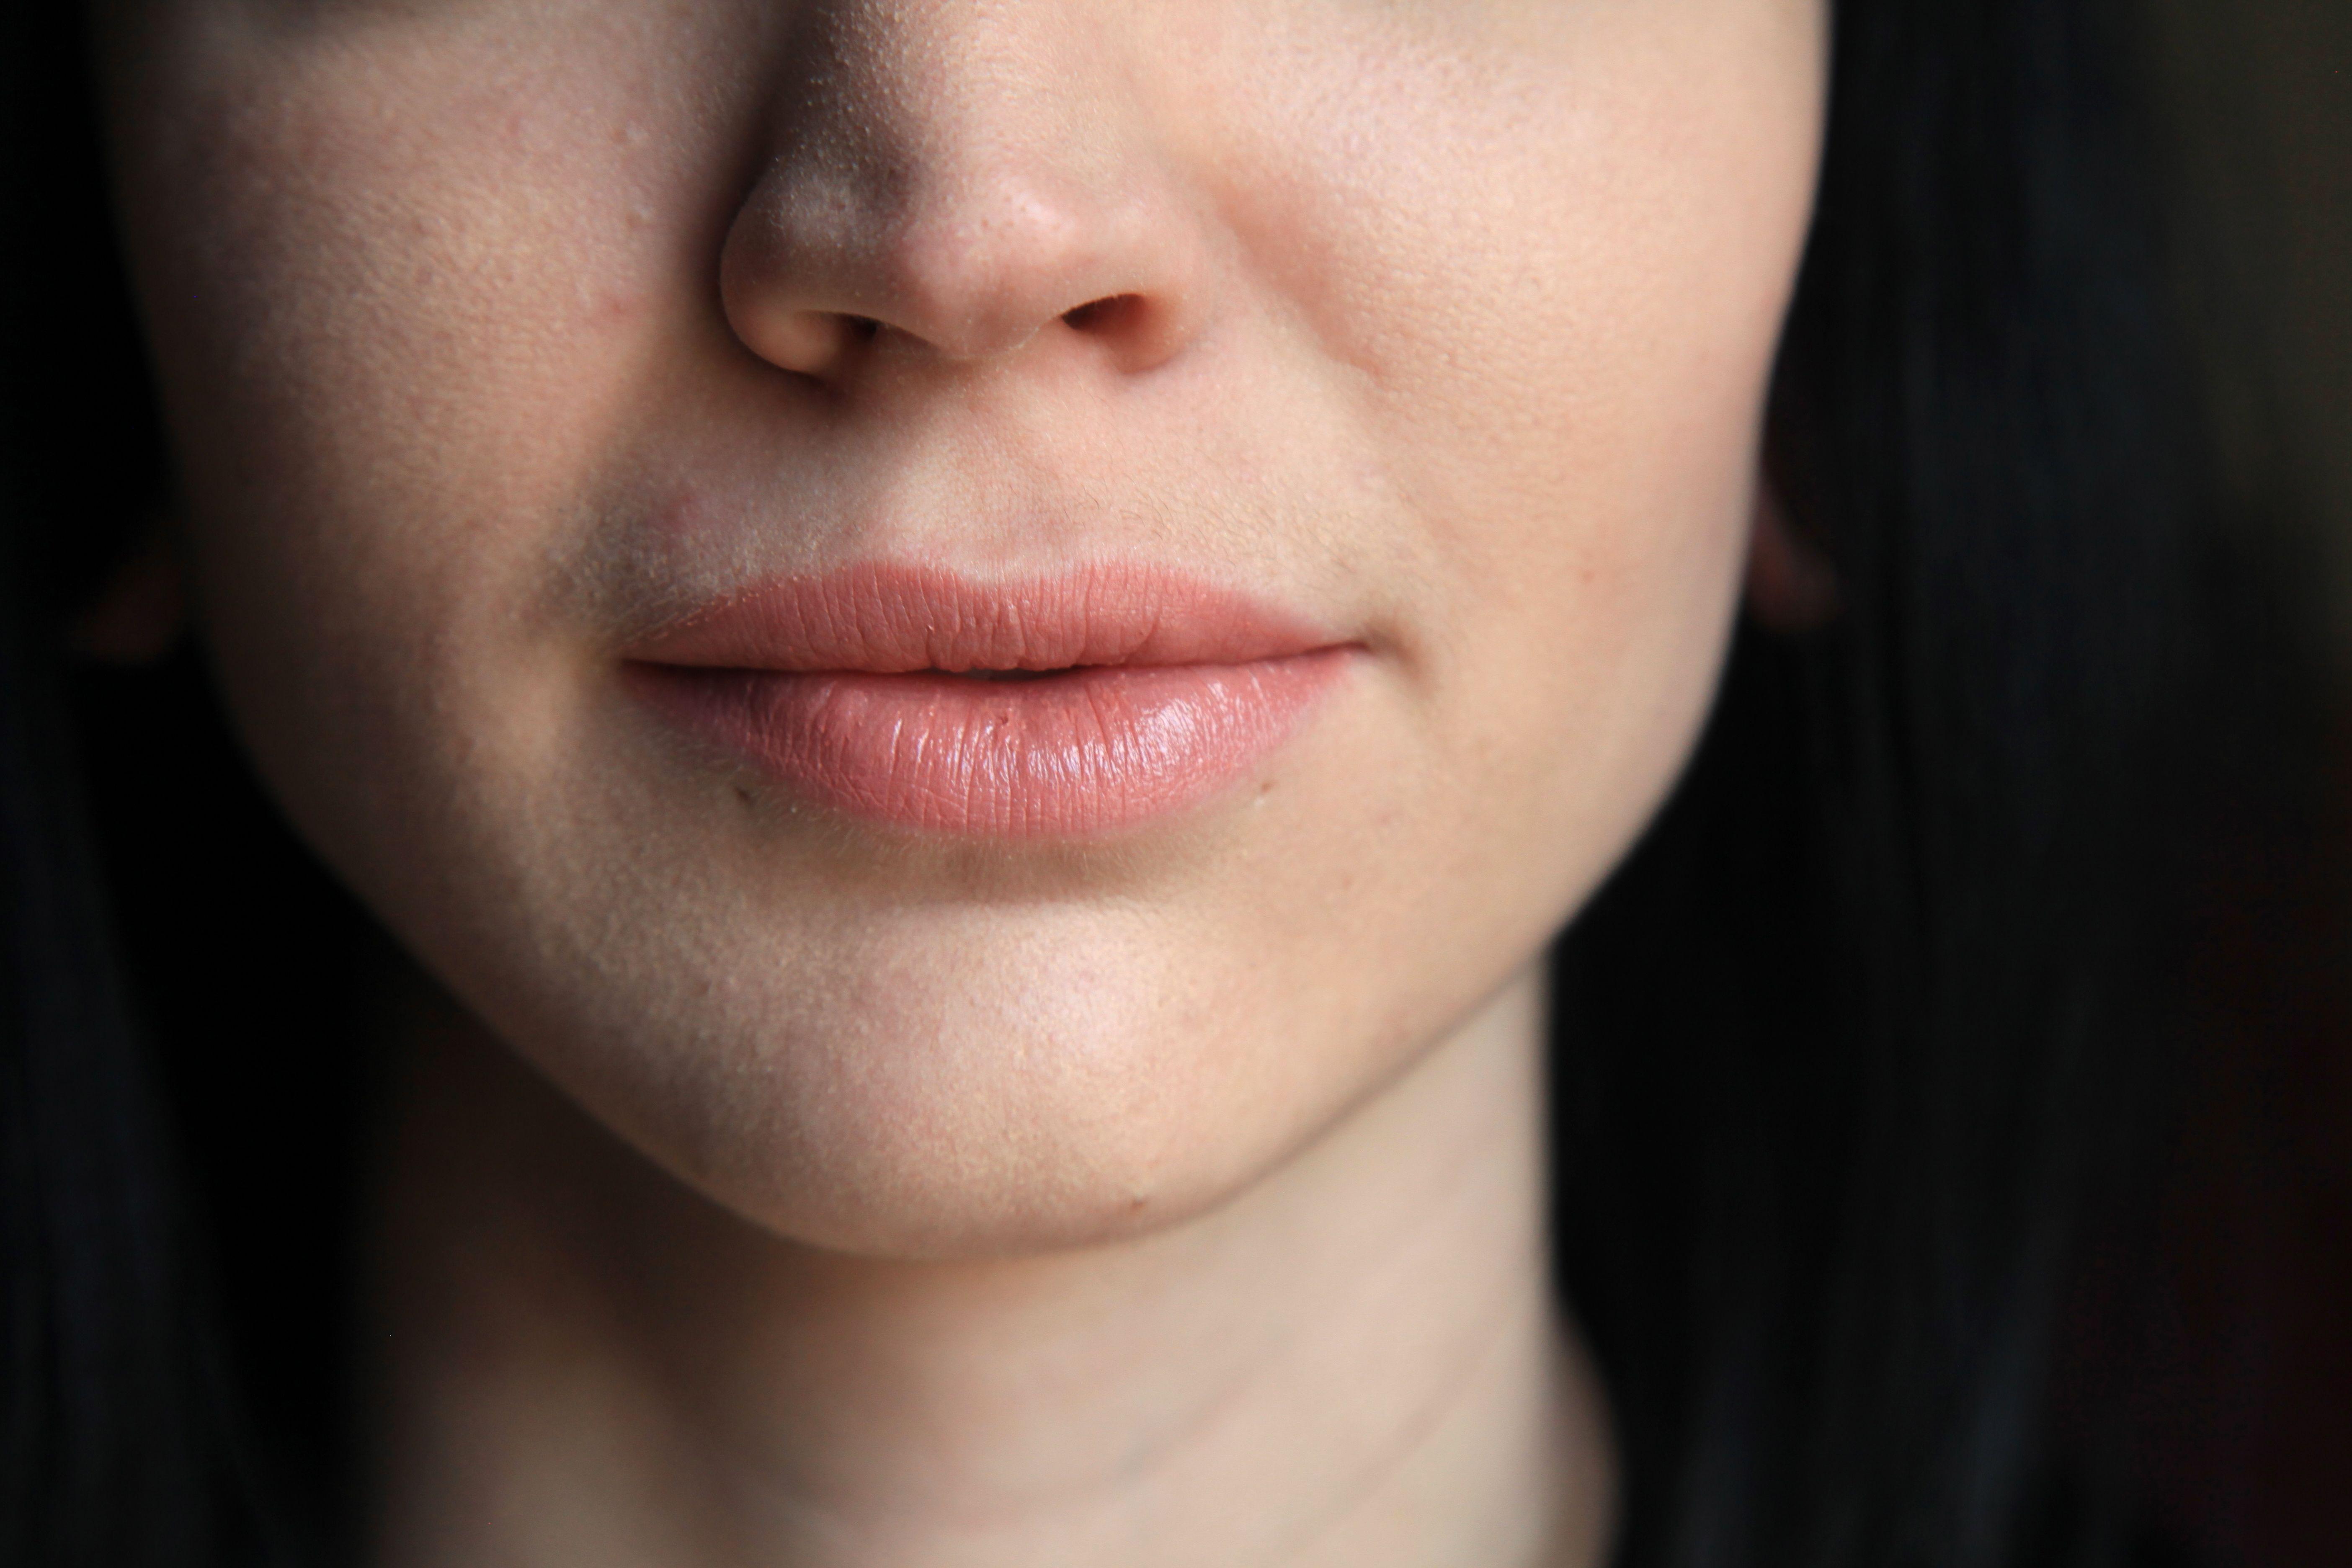 Hairy upper lip